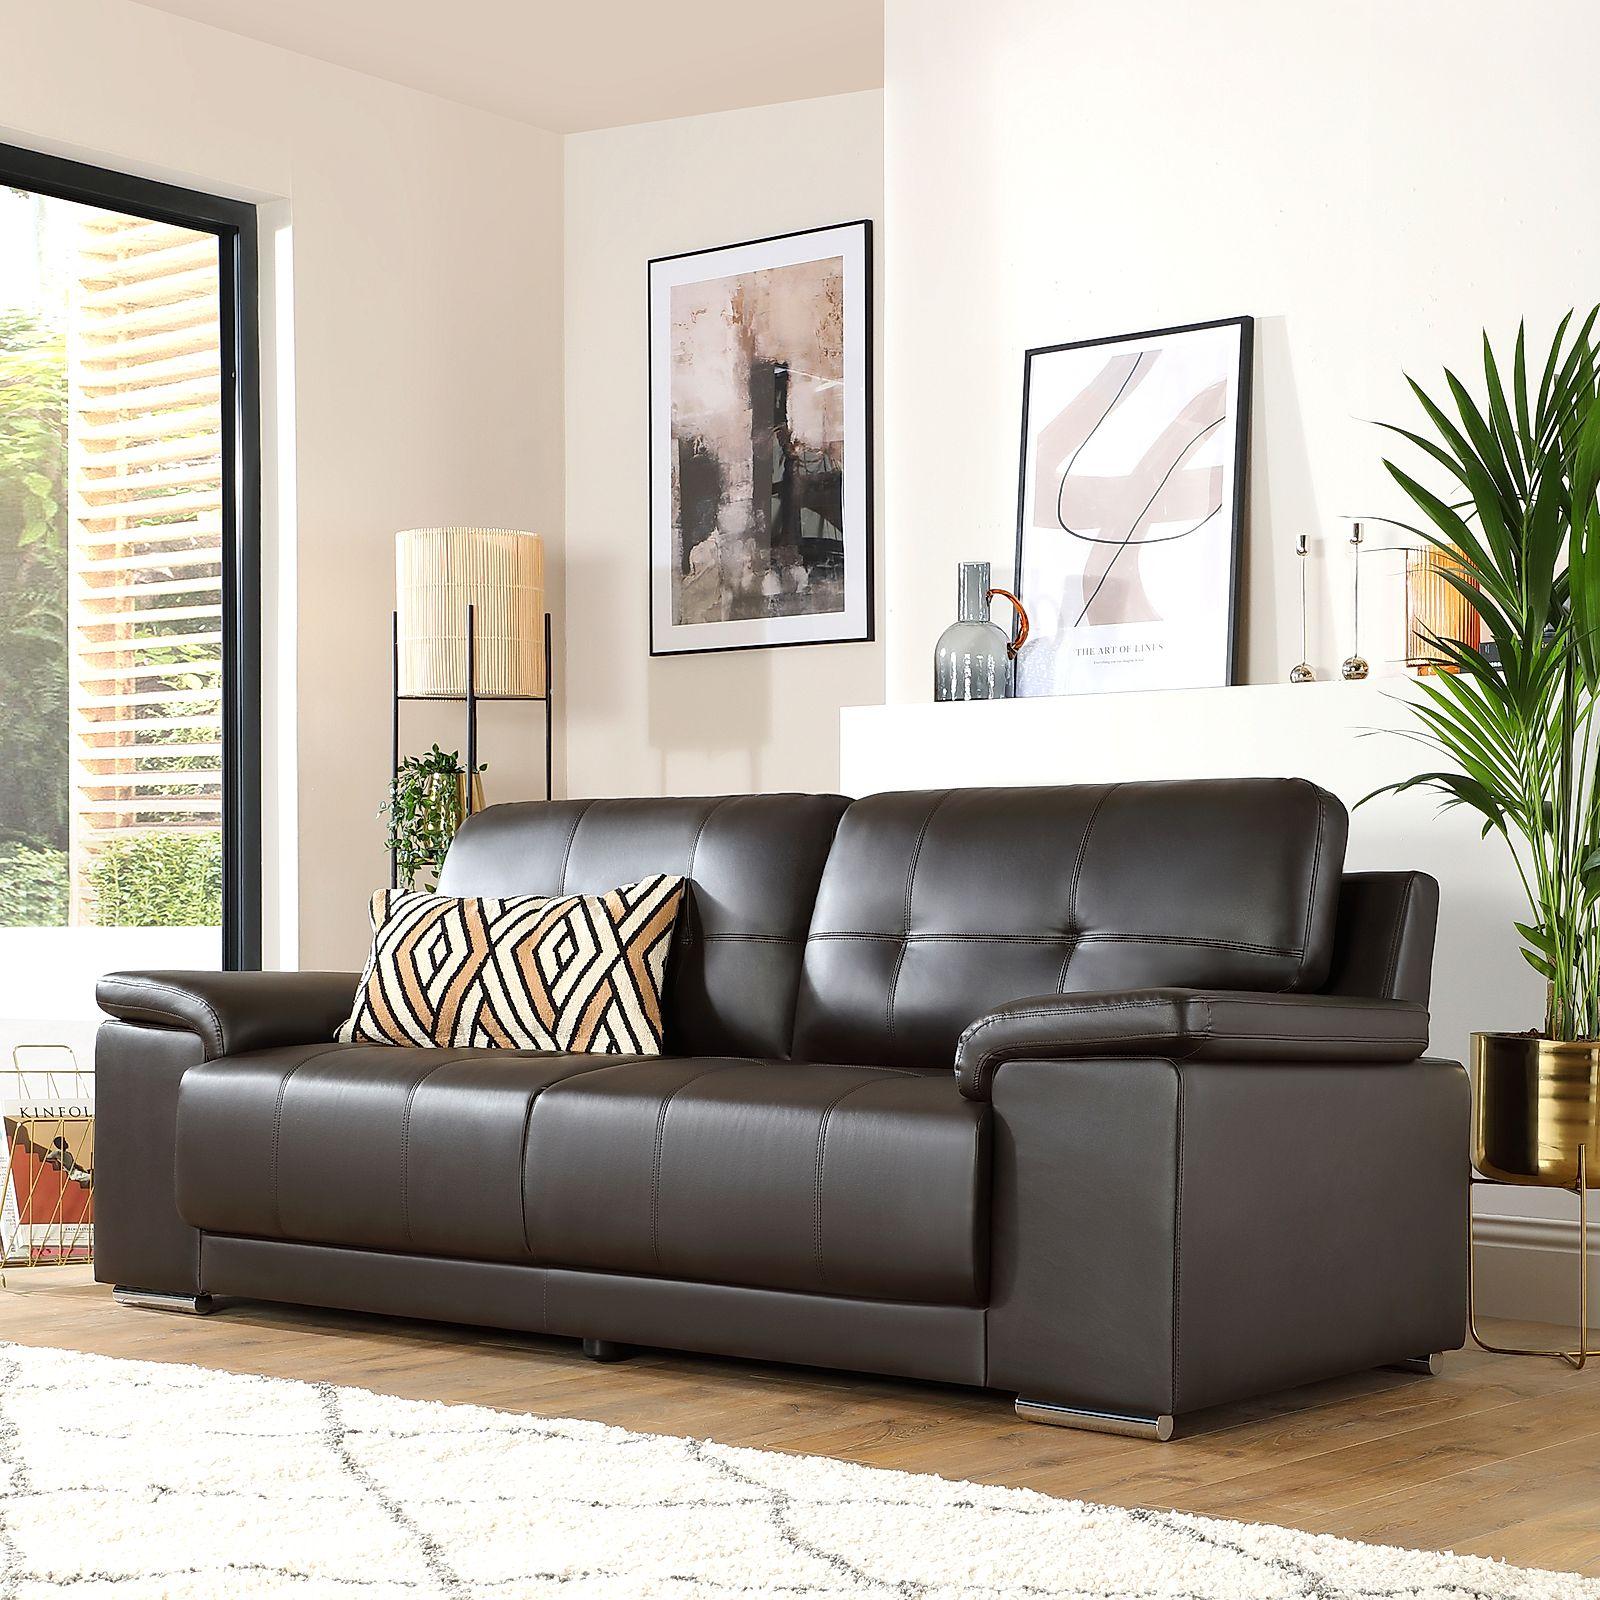 Kansas Brown Leather 3+2 Seater Sofa Set